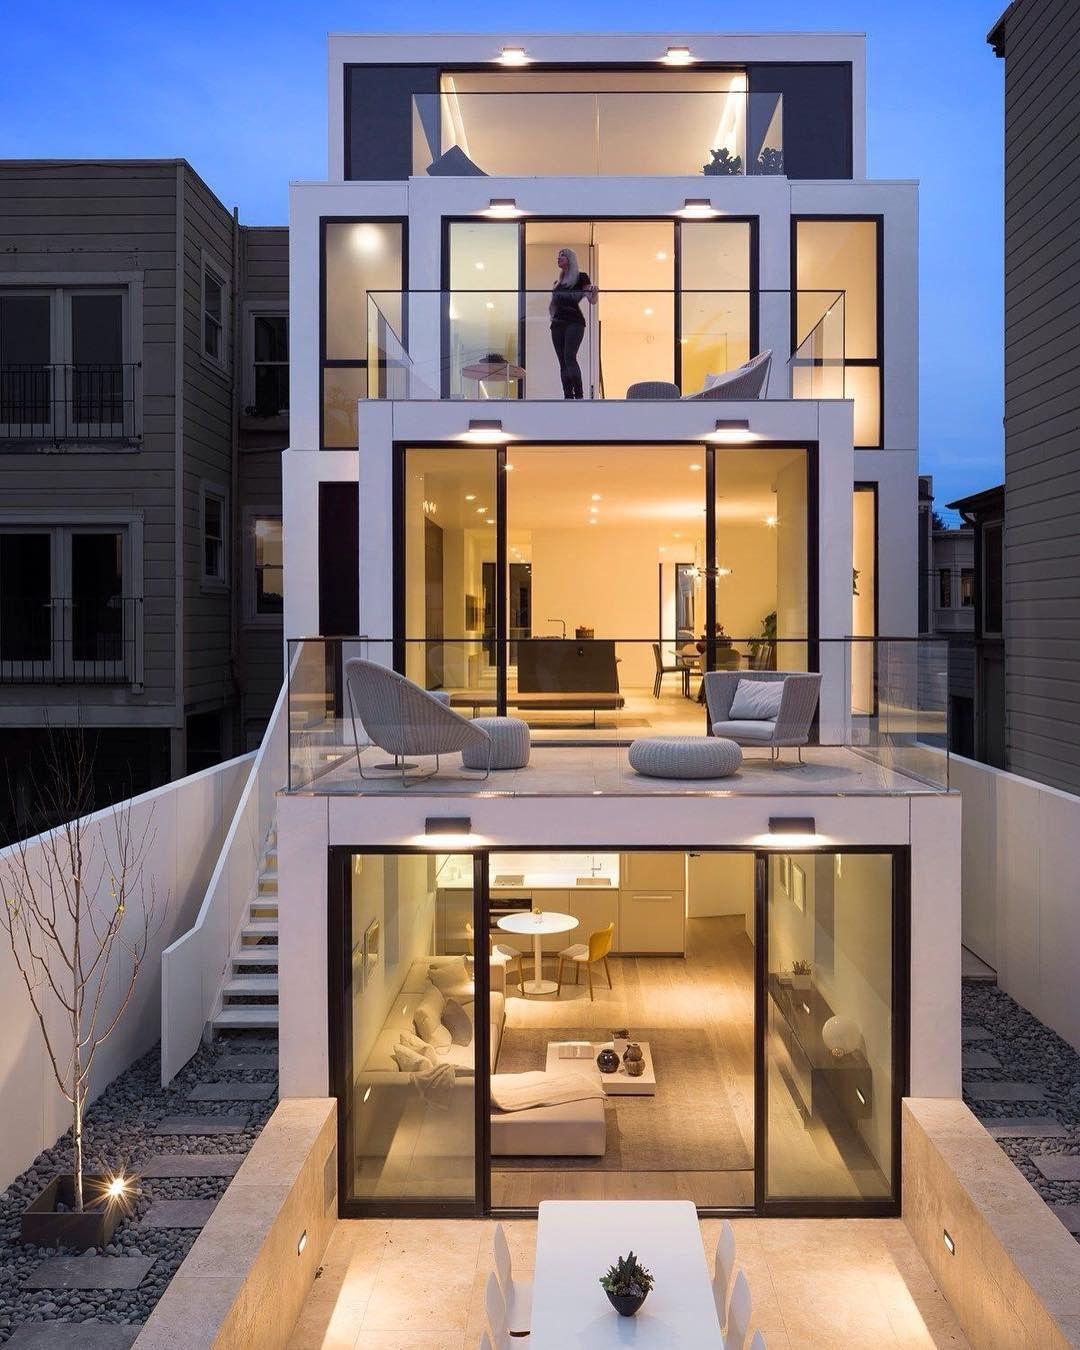 Dimitri 39 s house in the novel prior commitments beach - Casas arquitectura moderna ...